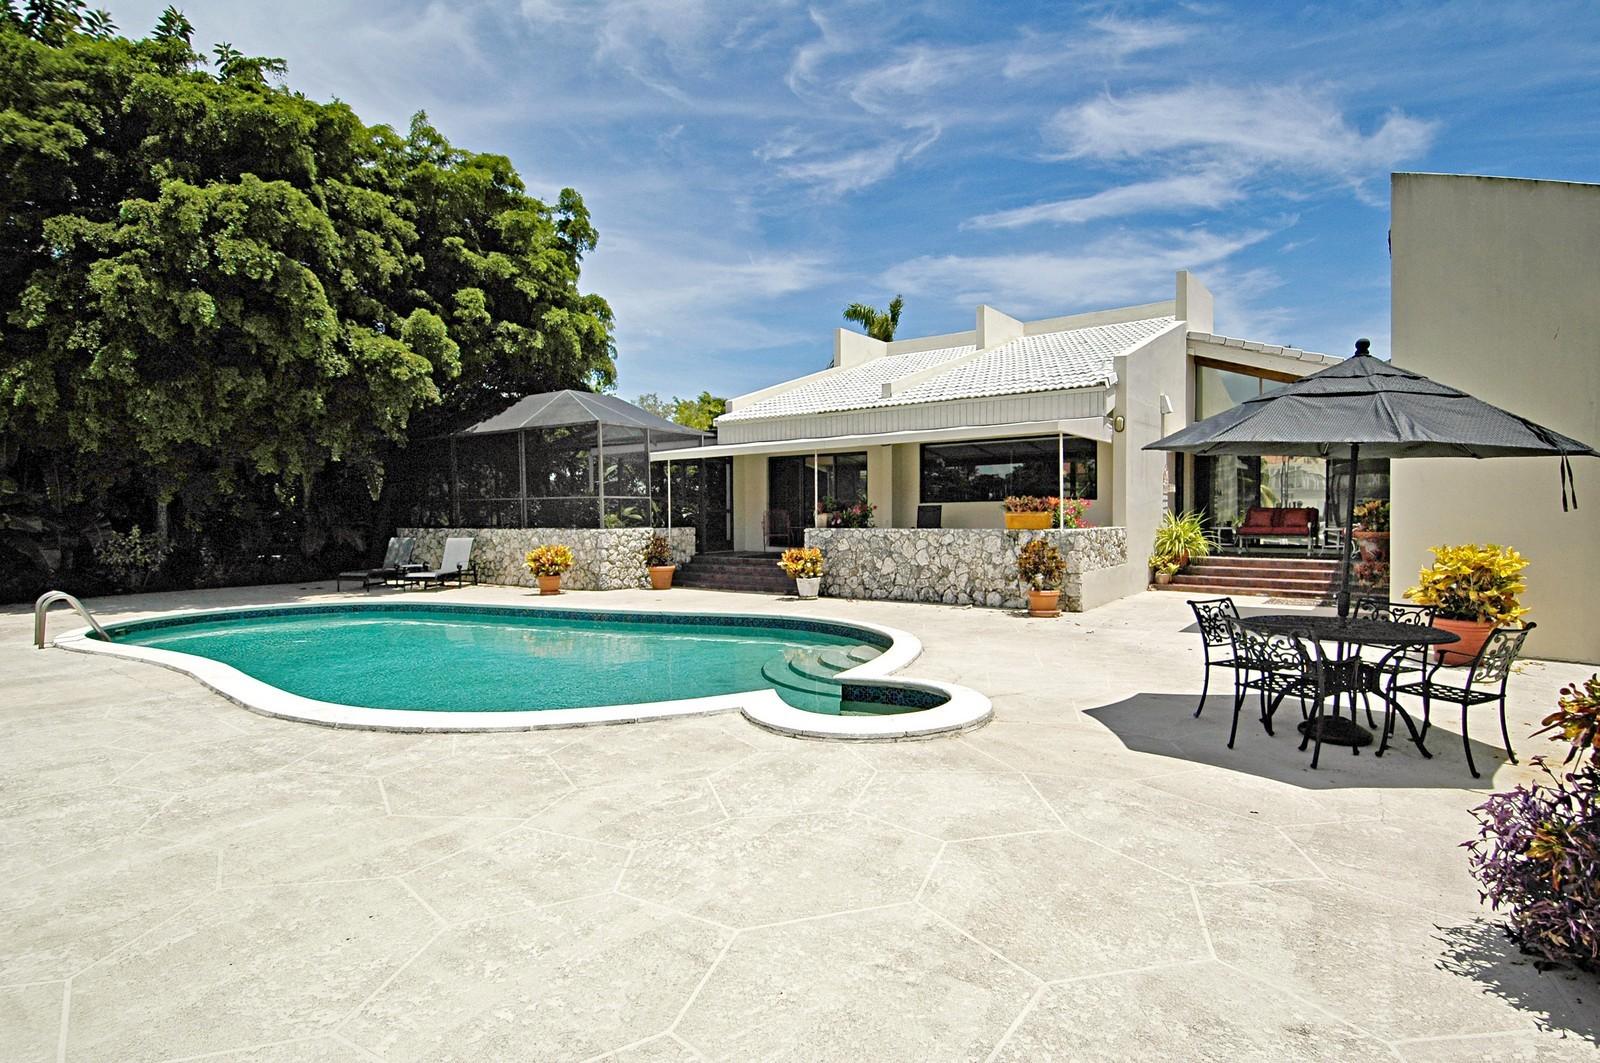 Real Estate Photography - 622 Golden Beach Dr, Golden Beach, FL, 33160 - Location 1